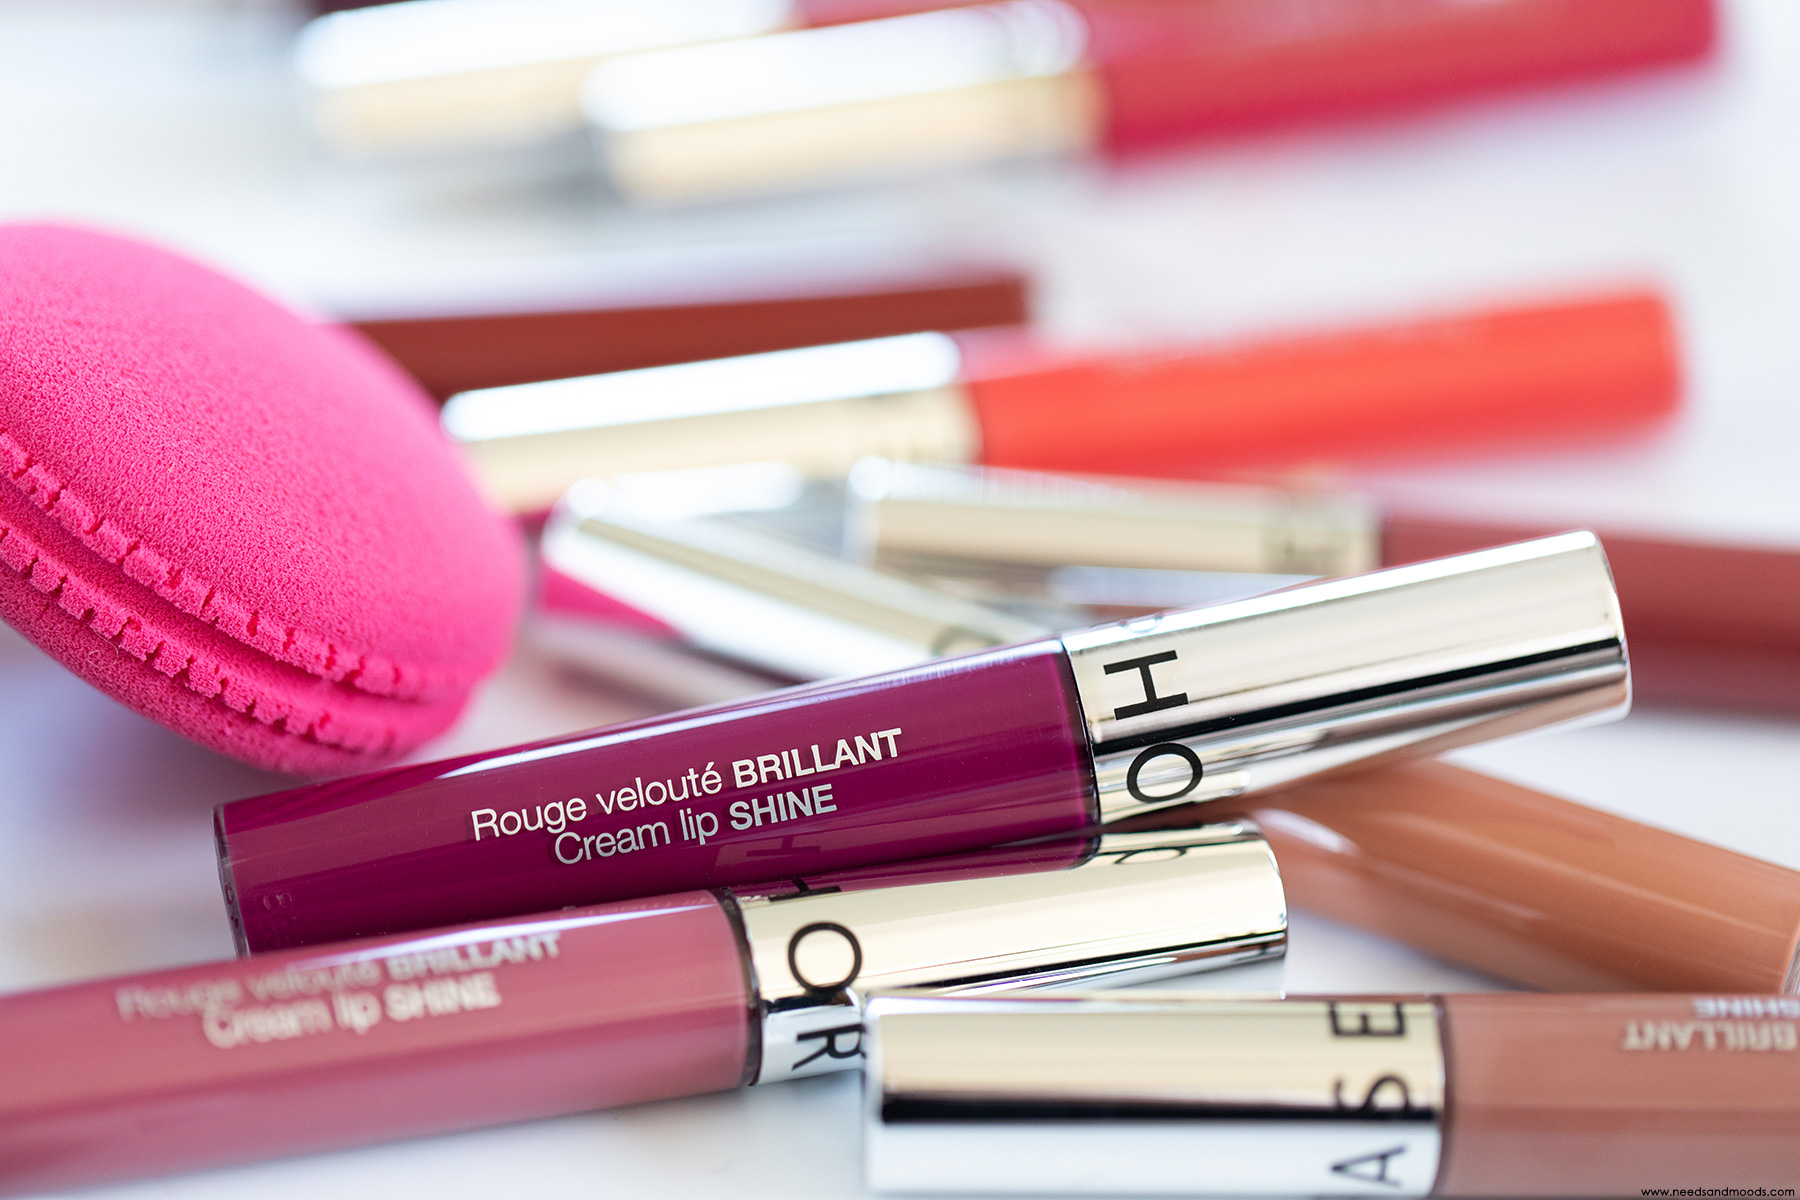 sephora cream lip shine rouge veloute brillant